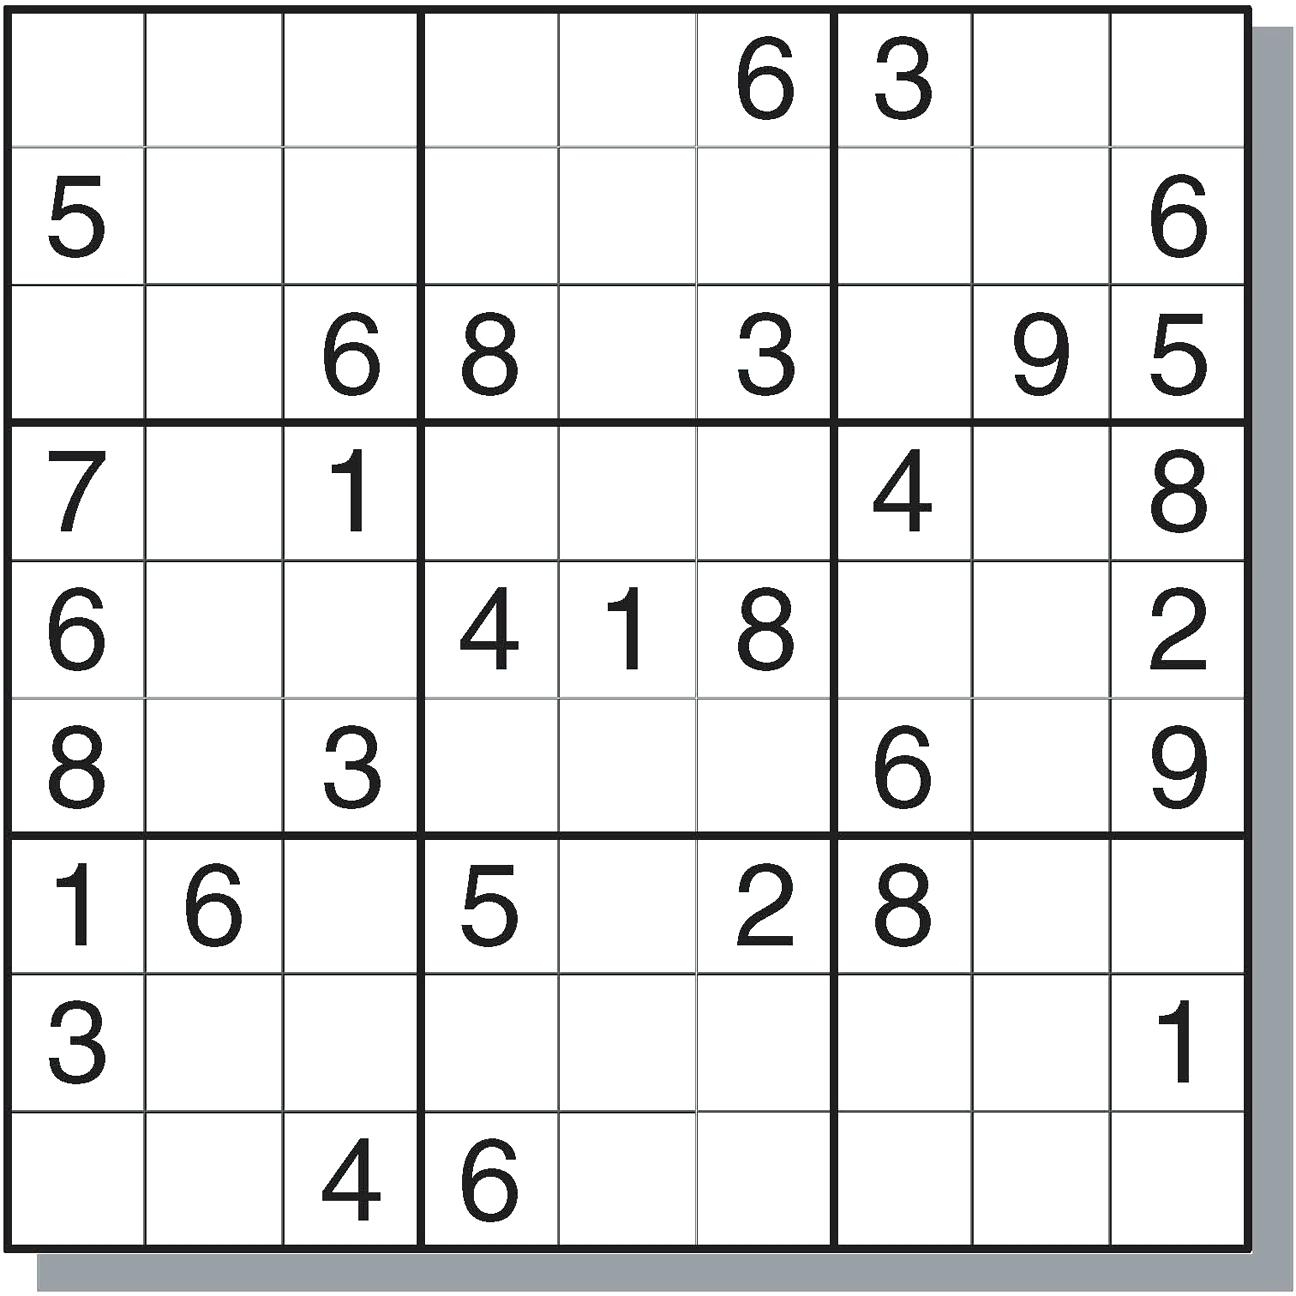 Worksheet : Easy Sudoku Puzzles Printable Flvipymy Screenshoot On - Printable Sudoku Puzzles Easy #1